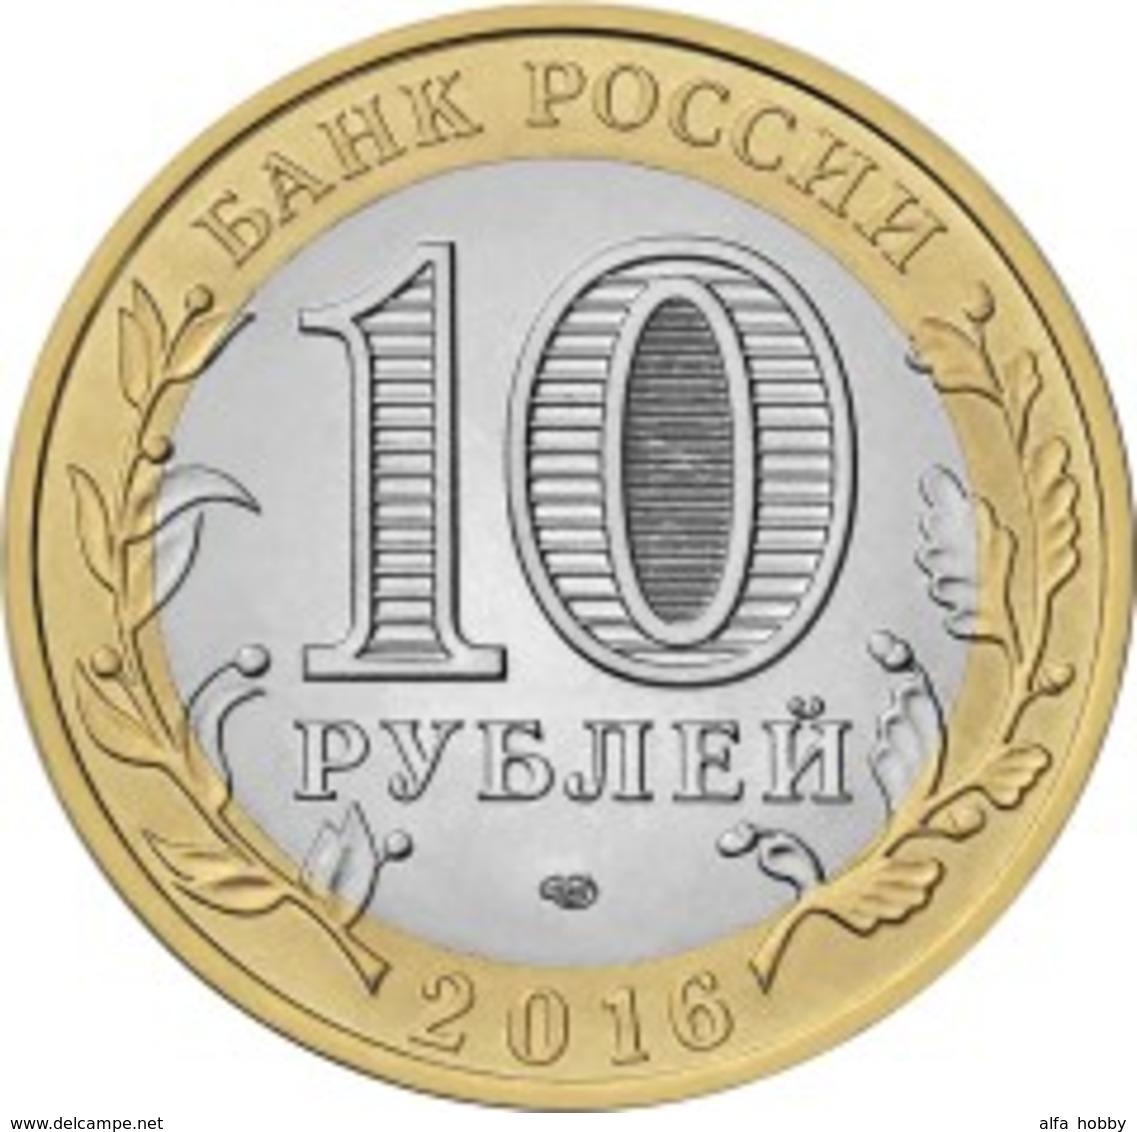 Russia, Belgorodsky Region 2016 10 Rbl Rubels Rubles Bi-metallic Uncirculated - Russland